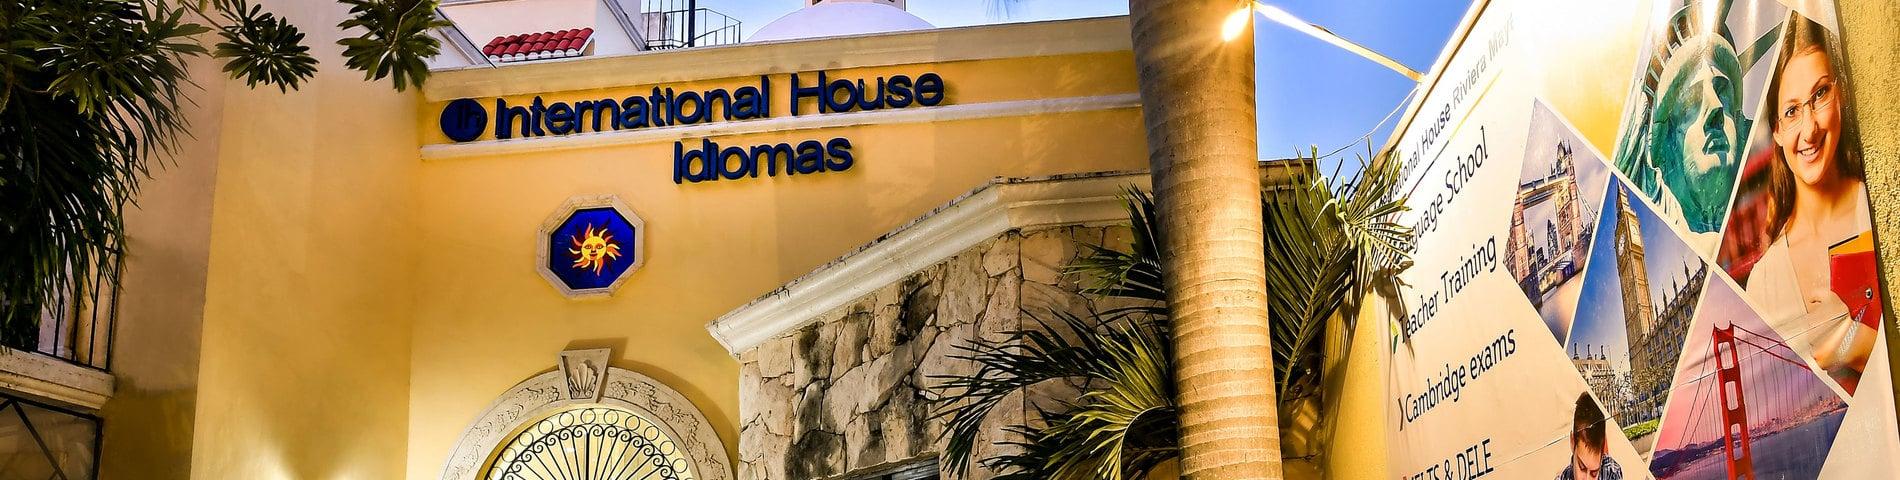 International House - Riviera Maya รูปภาพ 1